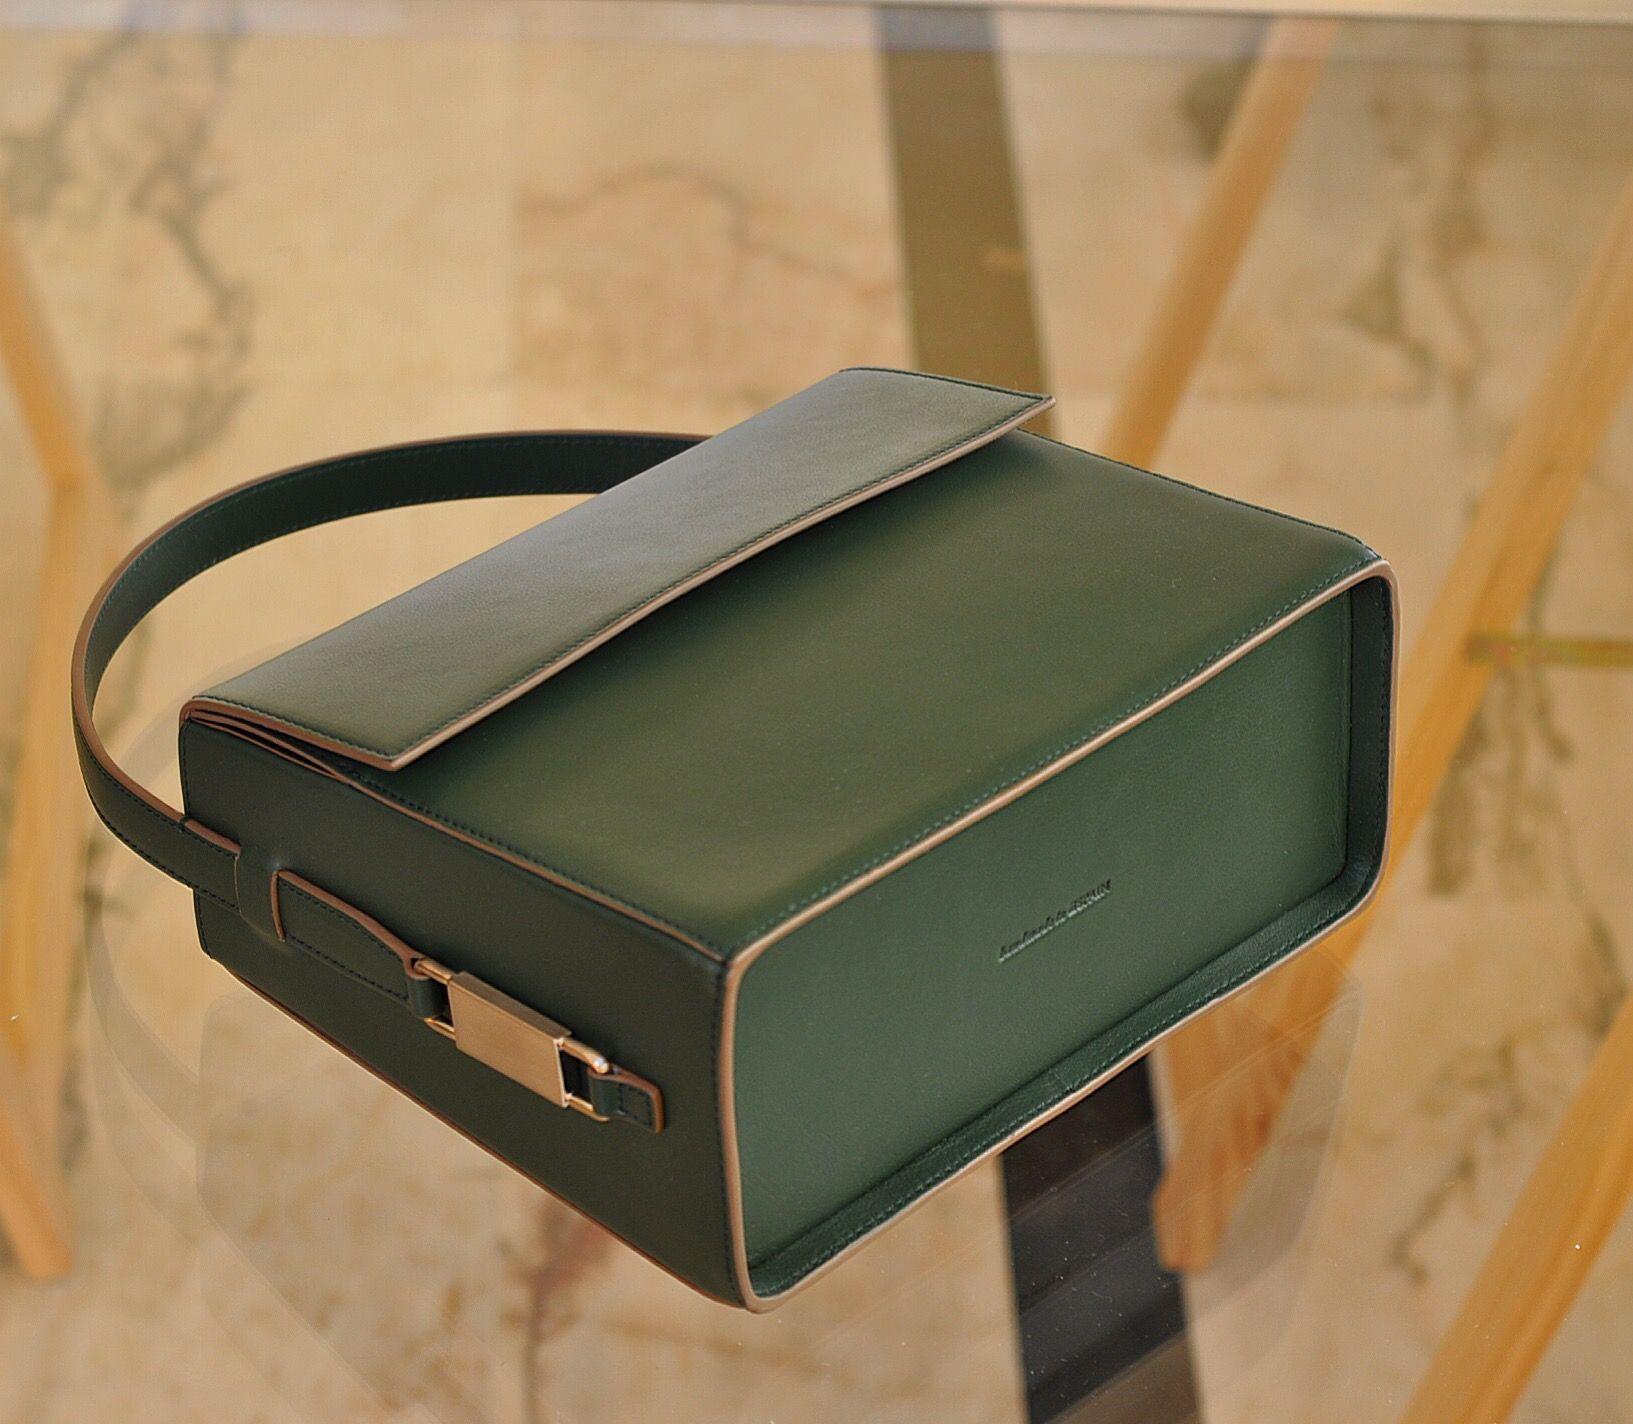 Sweet Lovely Valentine Green Lautem Design Handbag Www Lautemshop Com Leather Handbags Leather Bags Designer Fashion